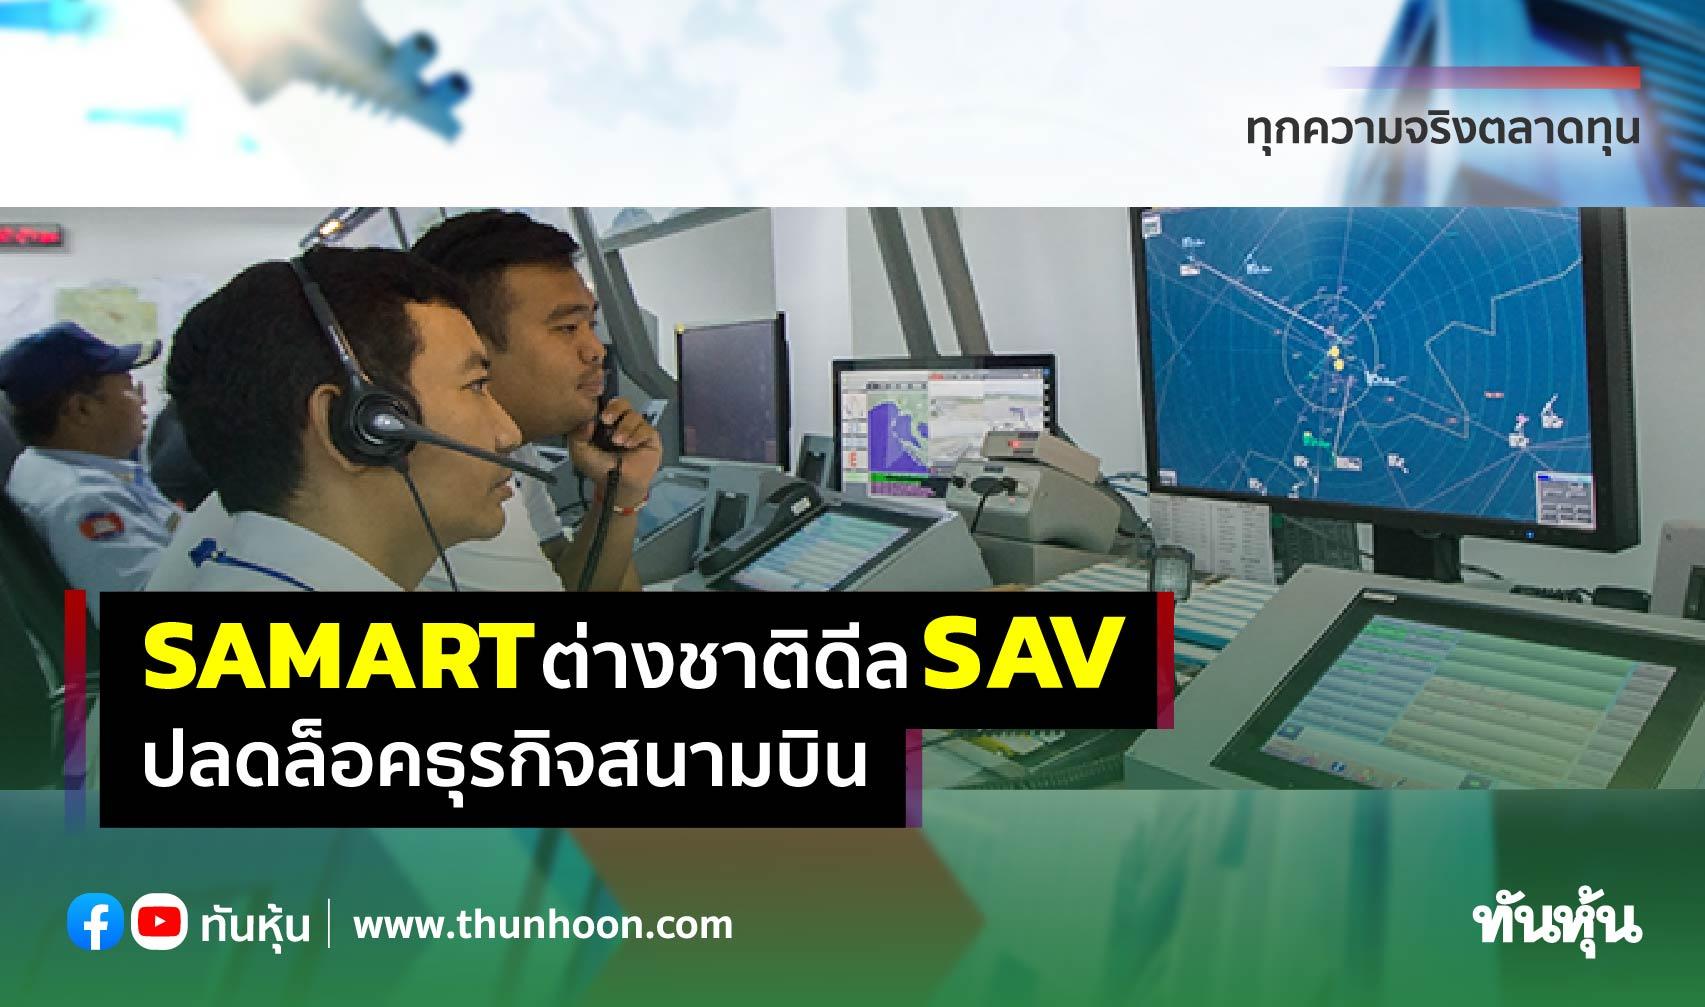 SAMARTต่างชาติดีลSAV ปลดล็อคธุรกิจสนามบิน